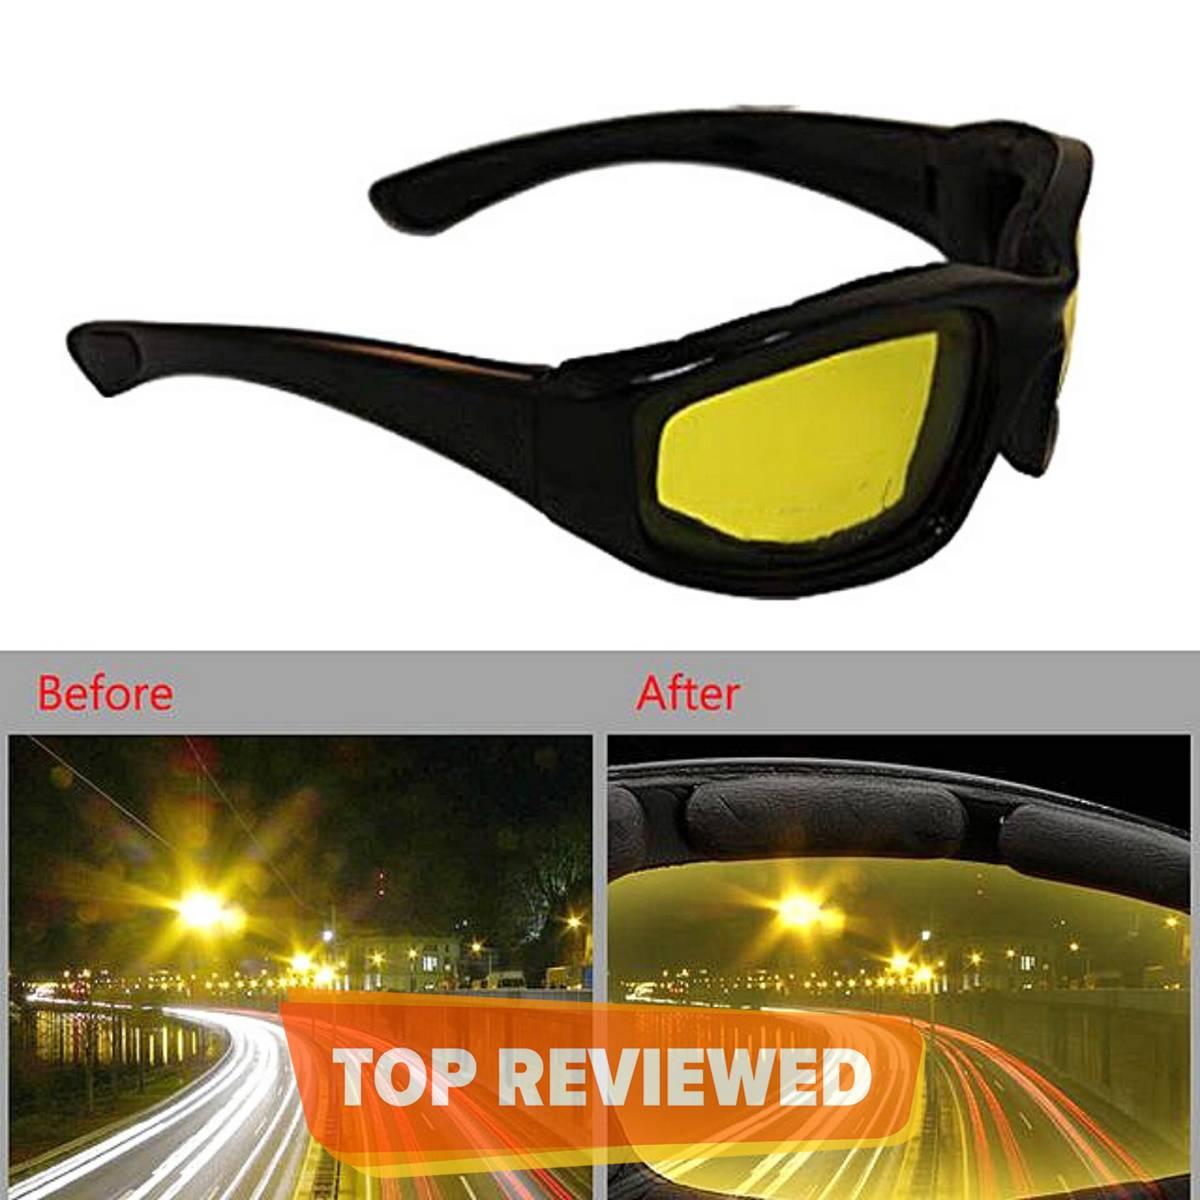 Day Night Vision Polarizing glasses Bike, Car Drivers Anti Glare Polarized UV Protection, HD Night Driving Unisex Sunglasses Goggles Auto Accessories